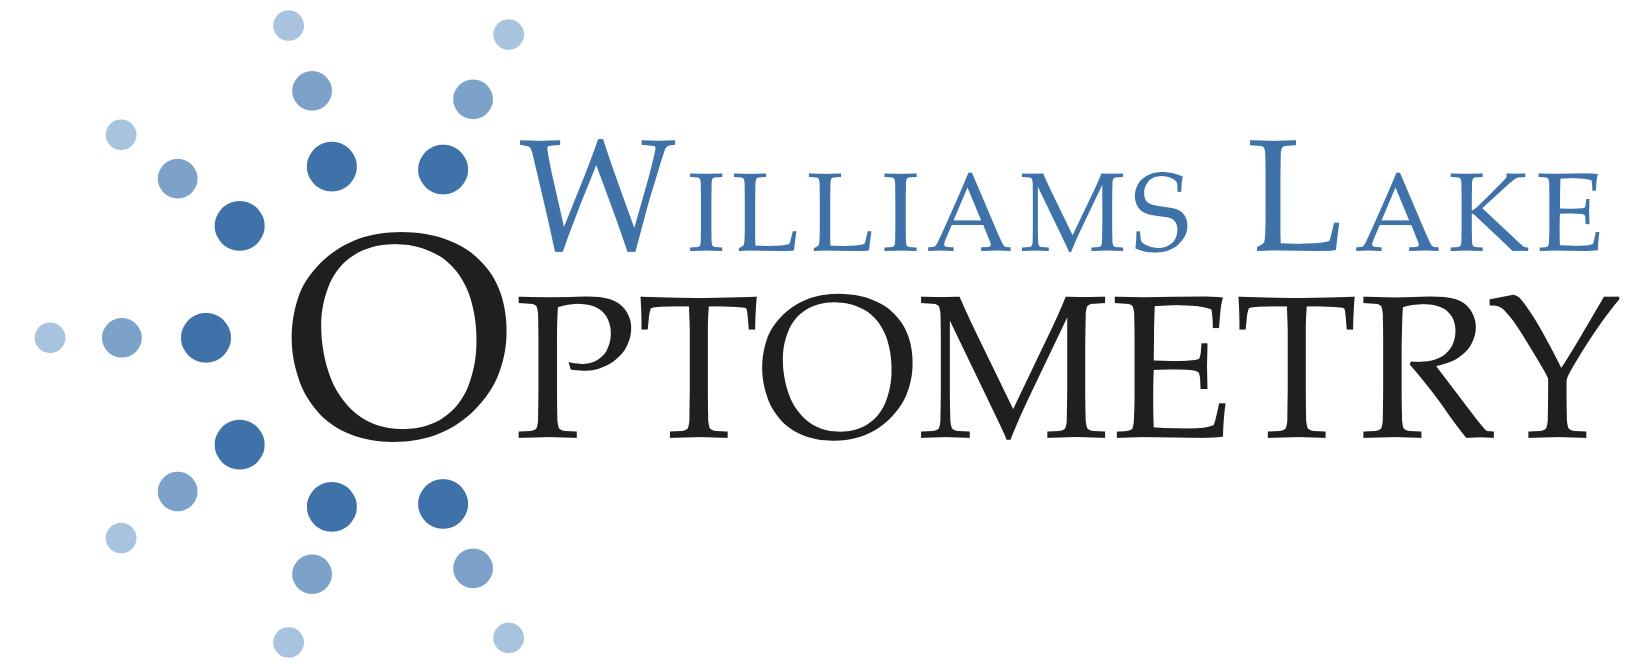 Williams Lake Optometry   Eye Doctor in Williams Lake, BC